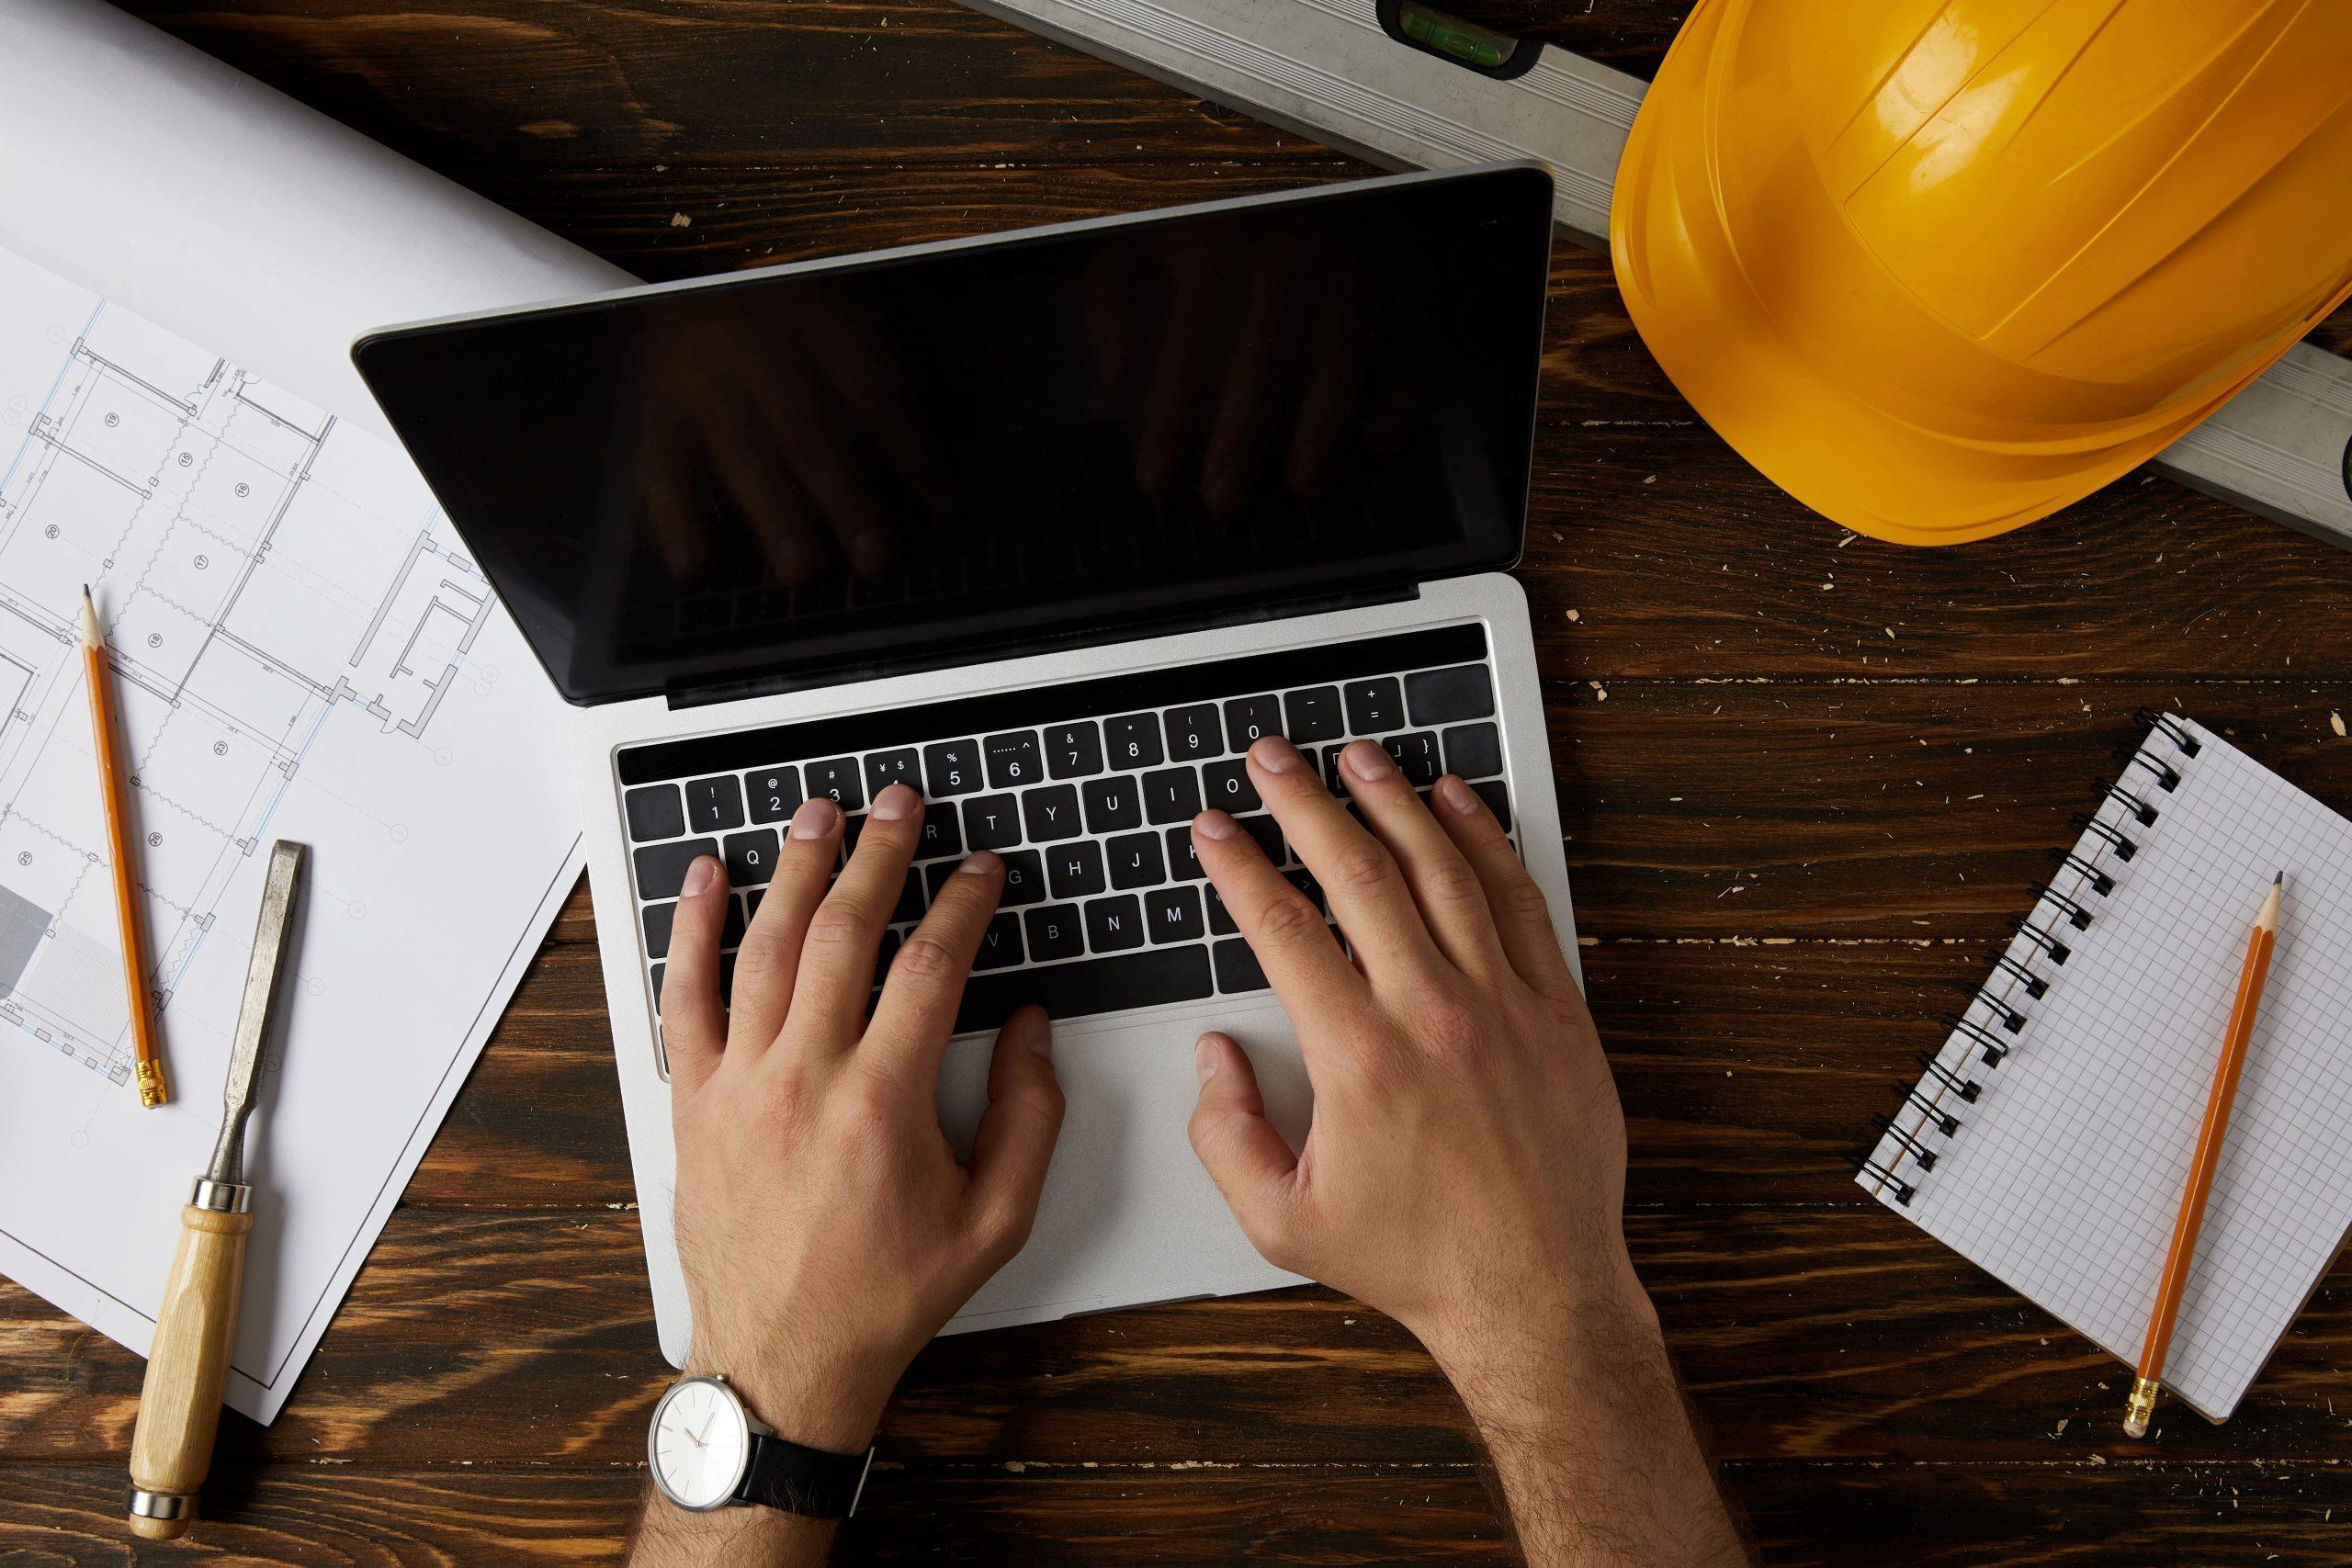 cropped-image-of-architect-typing-on-laptop-at-tab-5CRFP3J-min